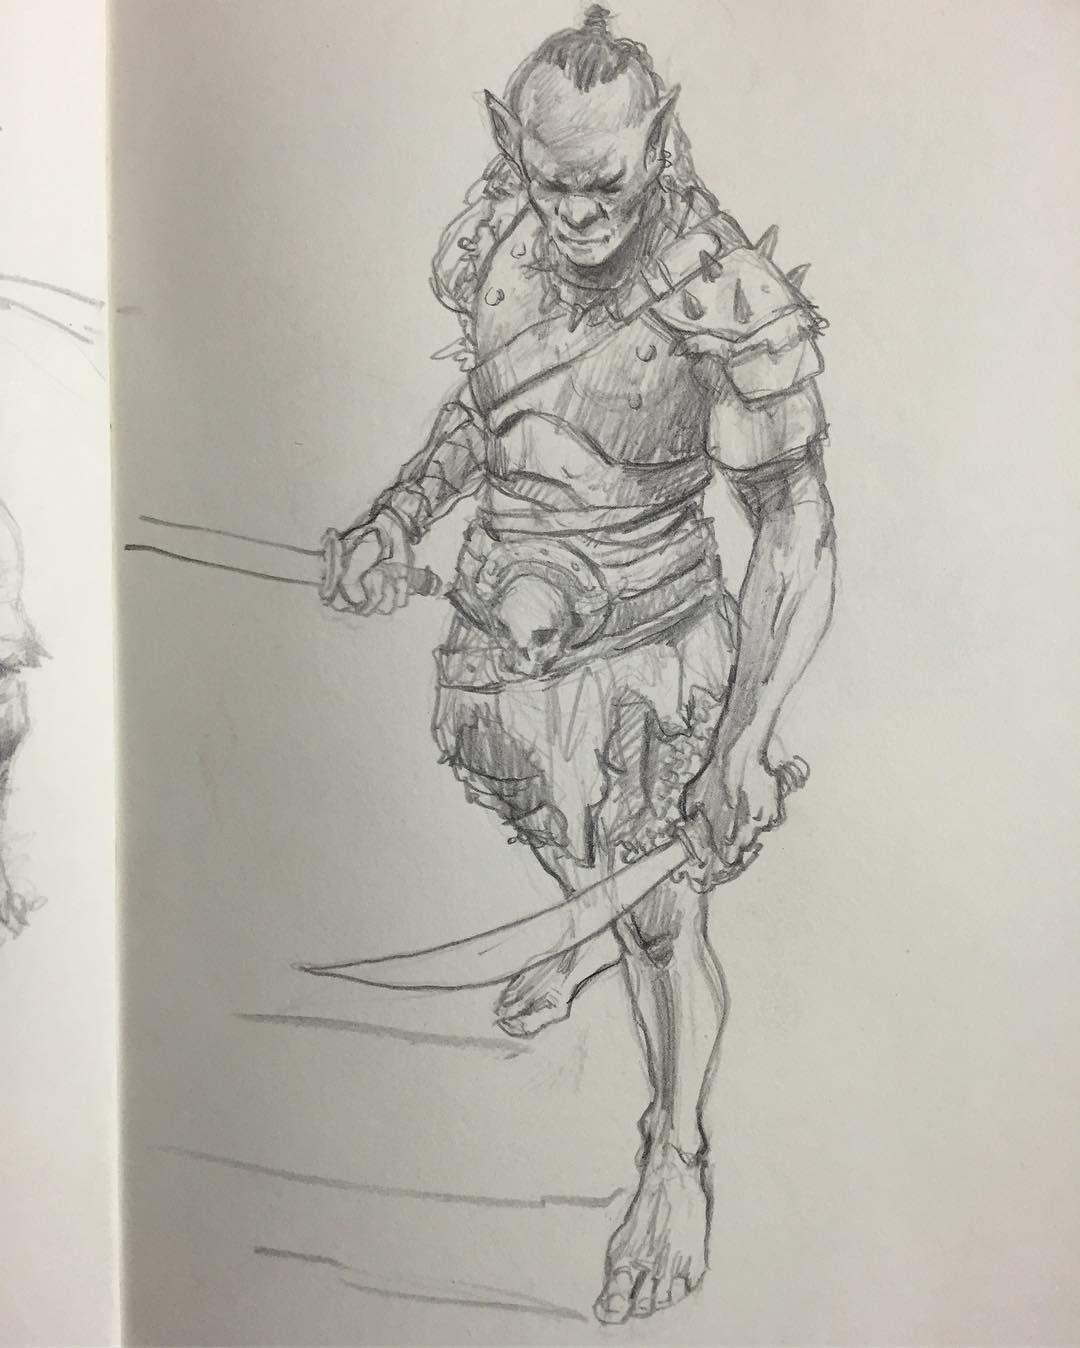 Orc for tonight's sketch. #pencil #pencildrawing # ...